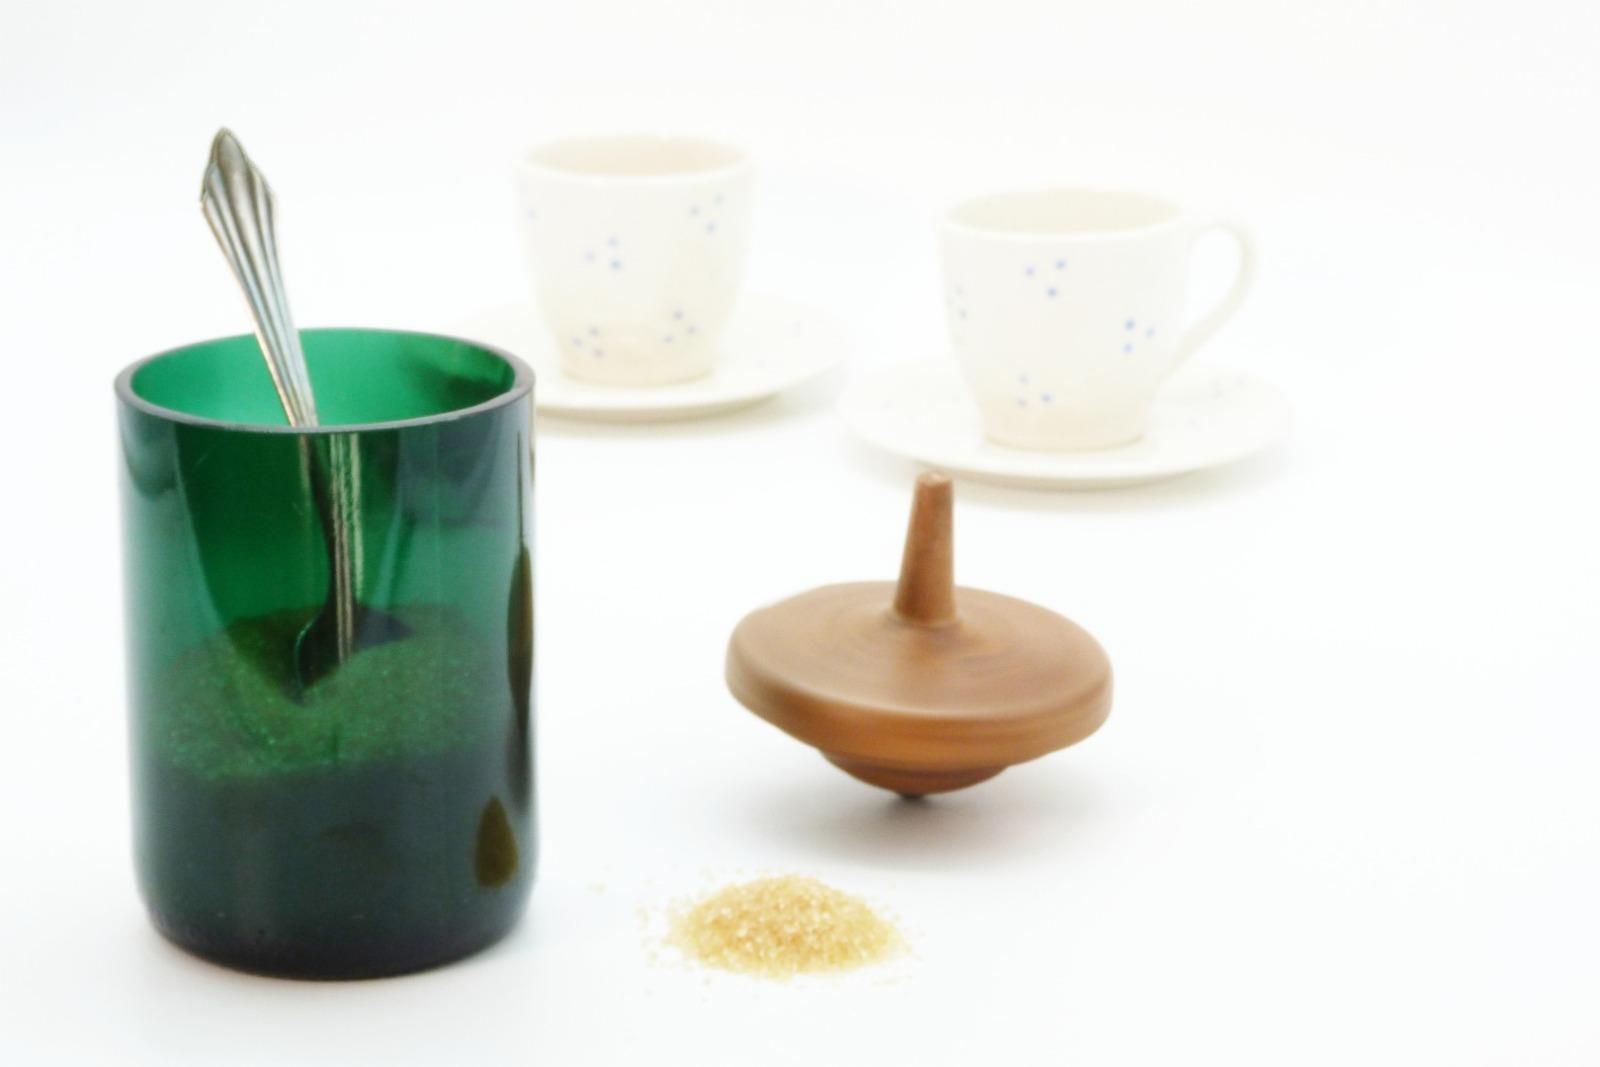 Zuckerdose aus Recyclingglas 7